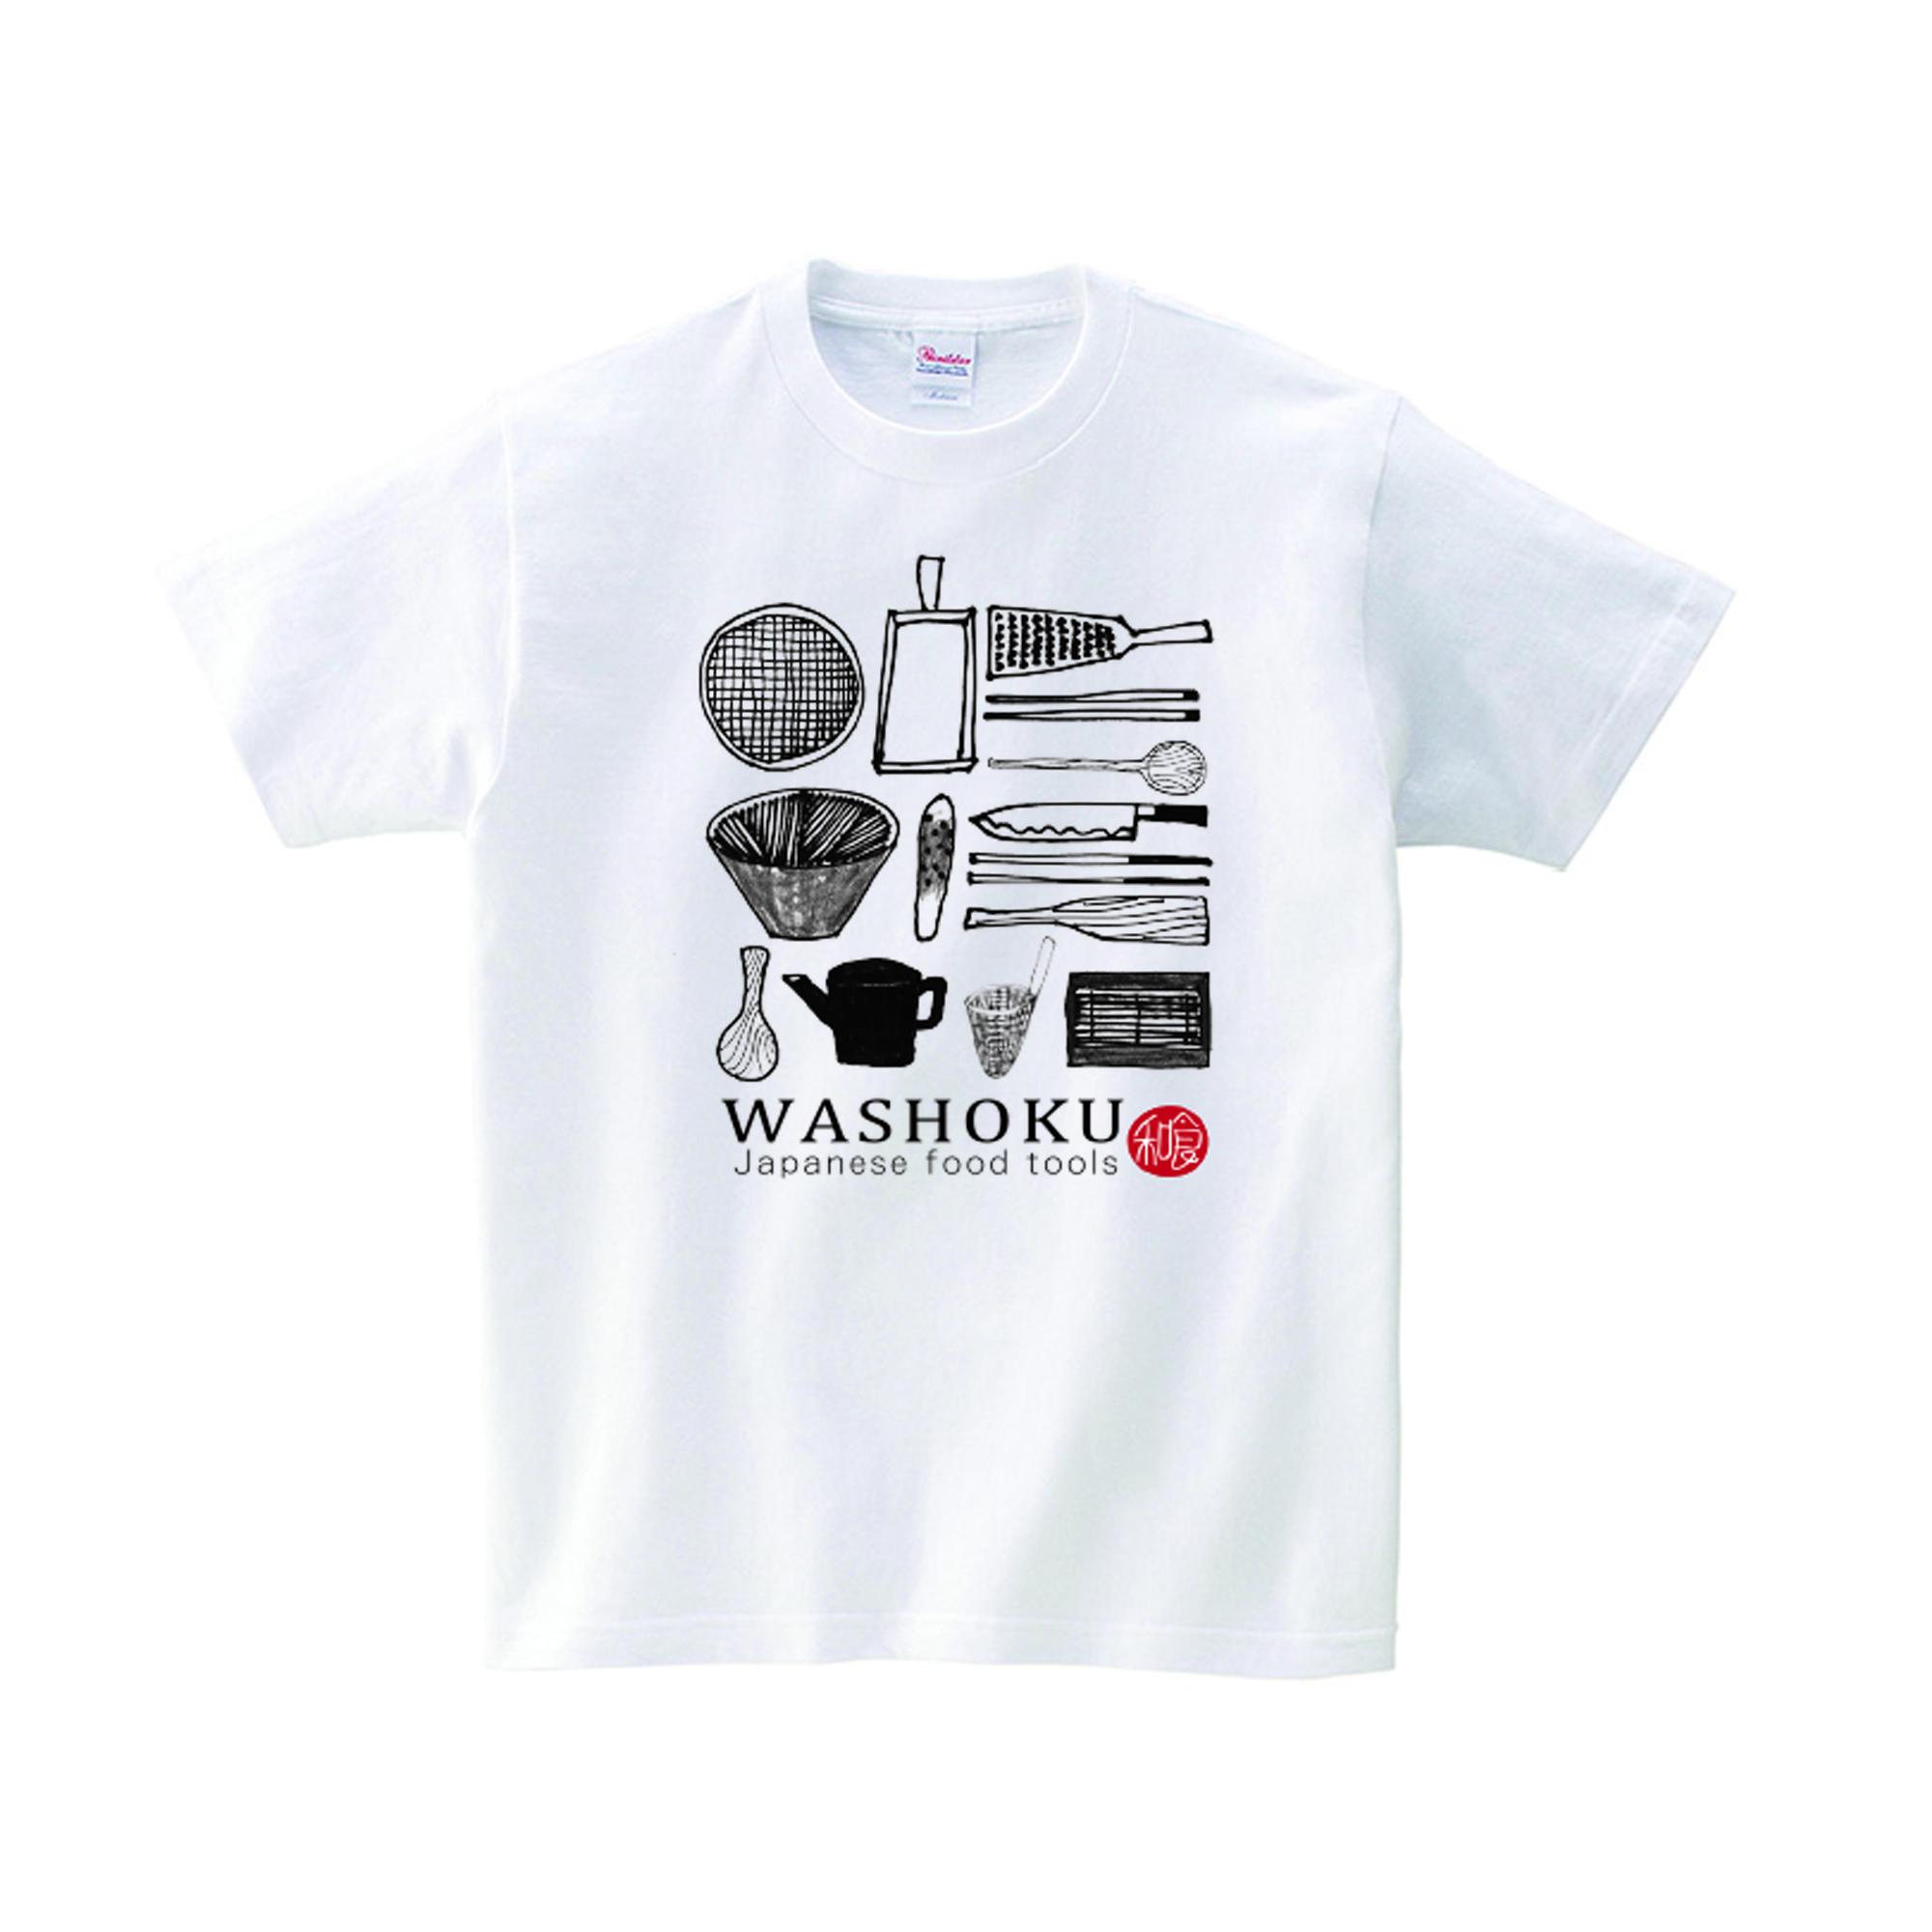 ・Tシャツ(S・M・L):3,520円(税込)